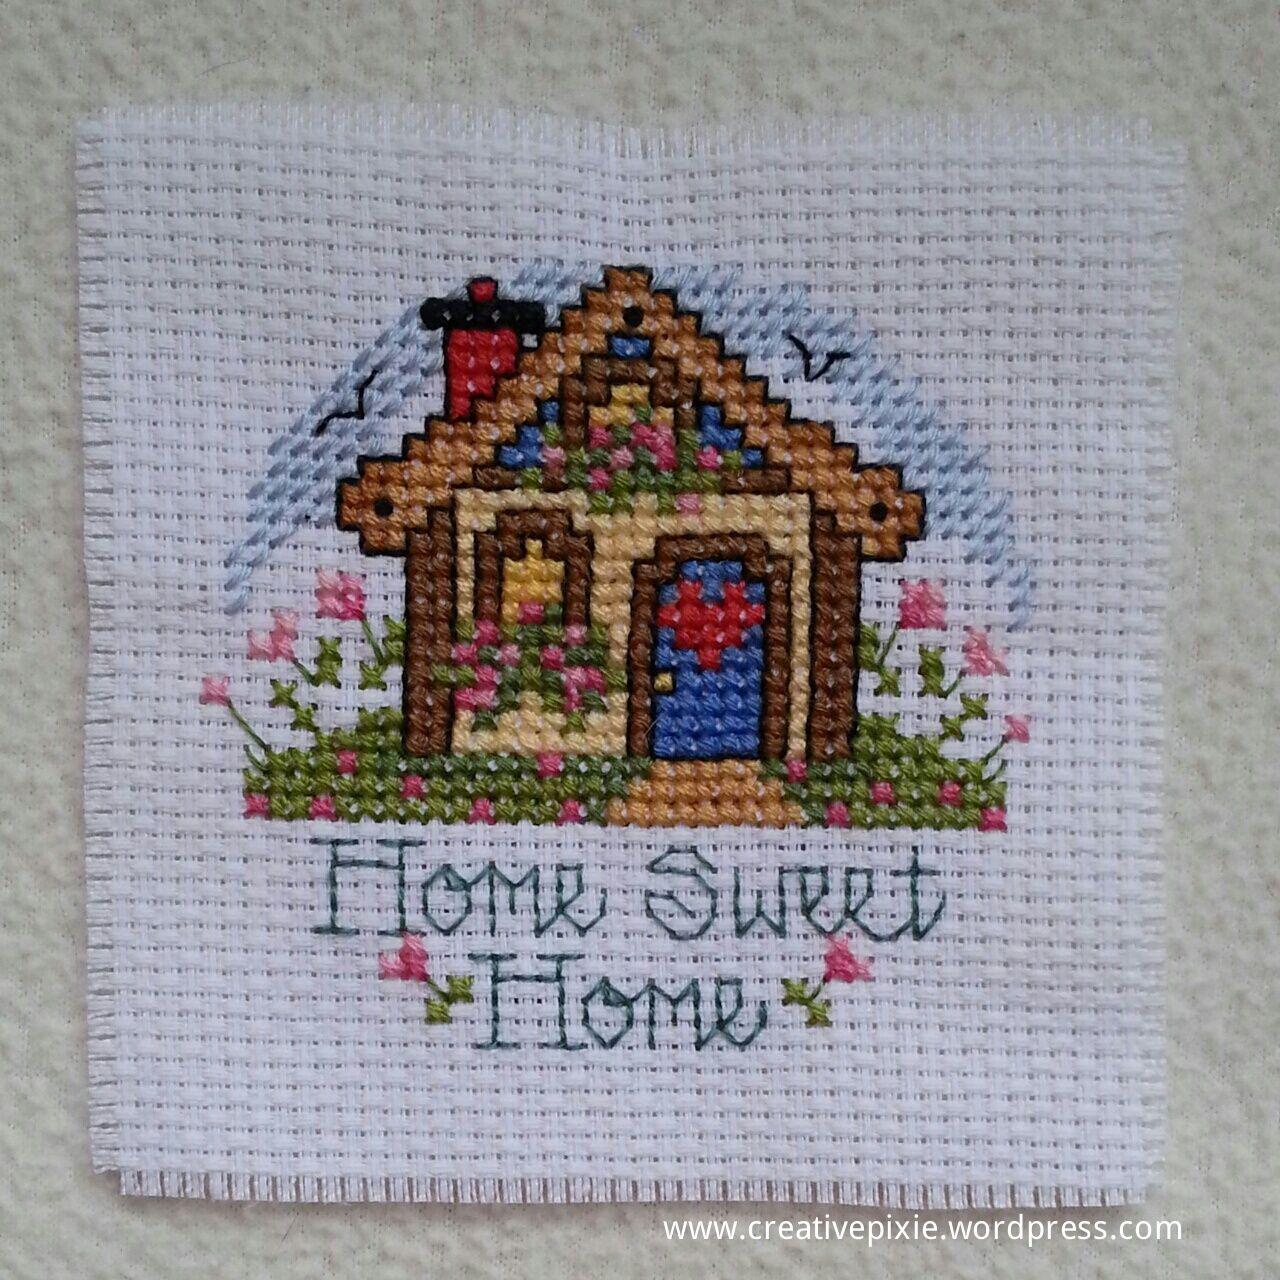 wpid-storageemulated0rhonna-designscreative-pixie-home ...